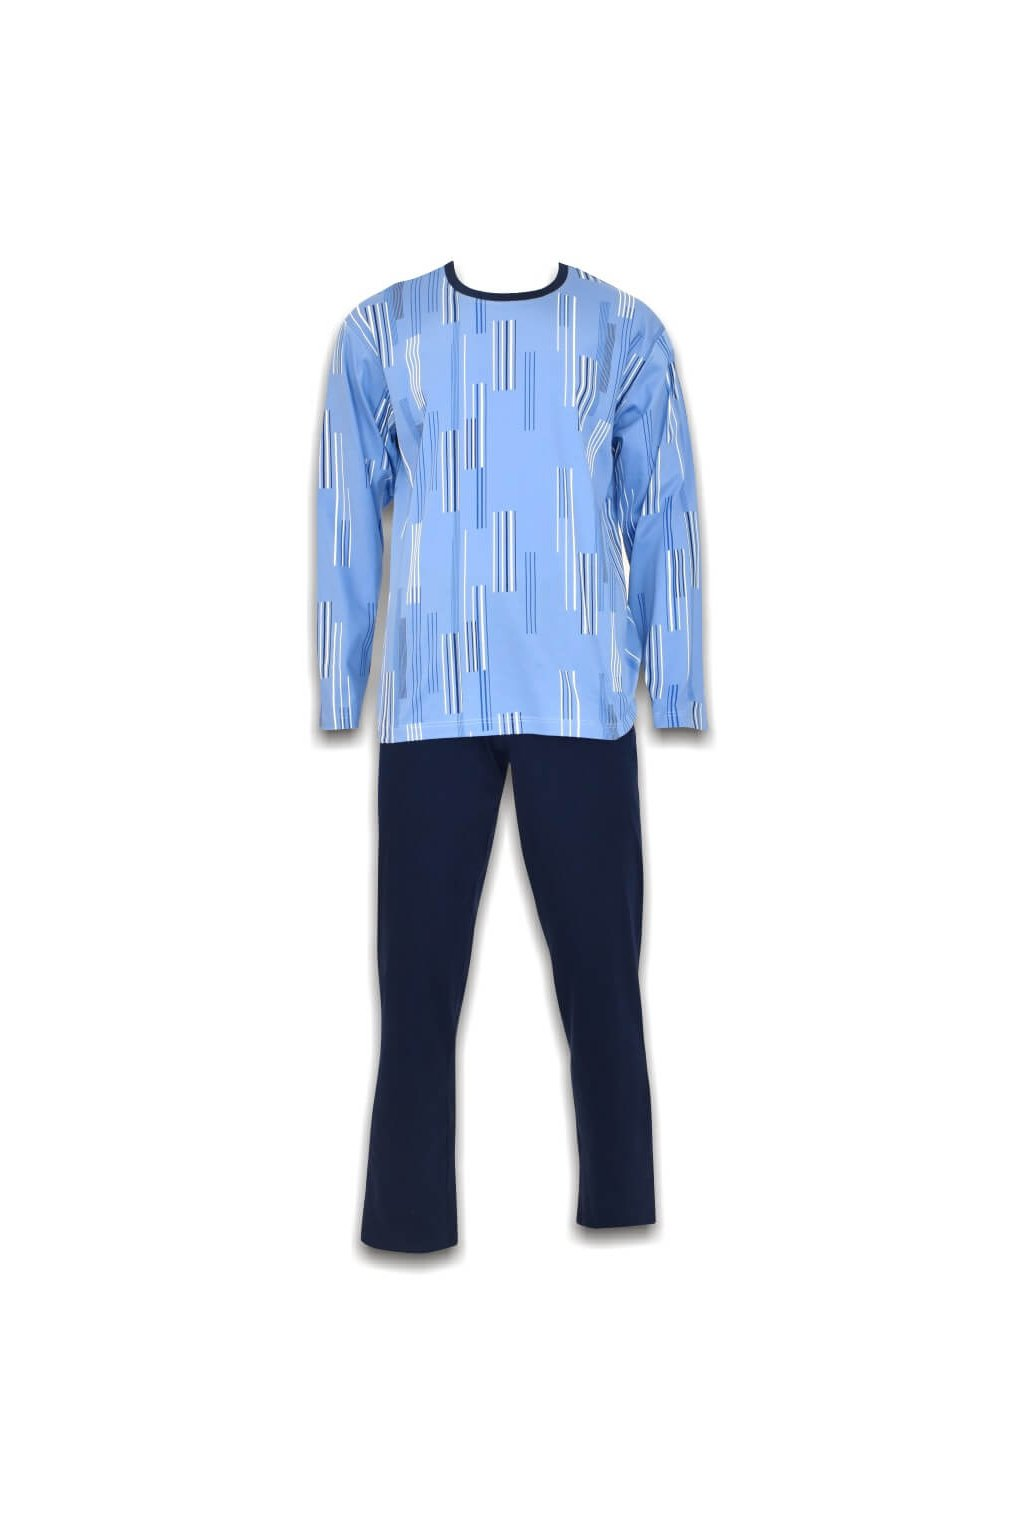 modré pyžamo RACING PYŽAMO G DR PÁSIK MOD